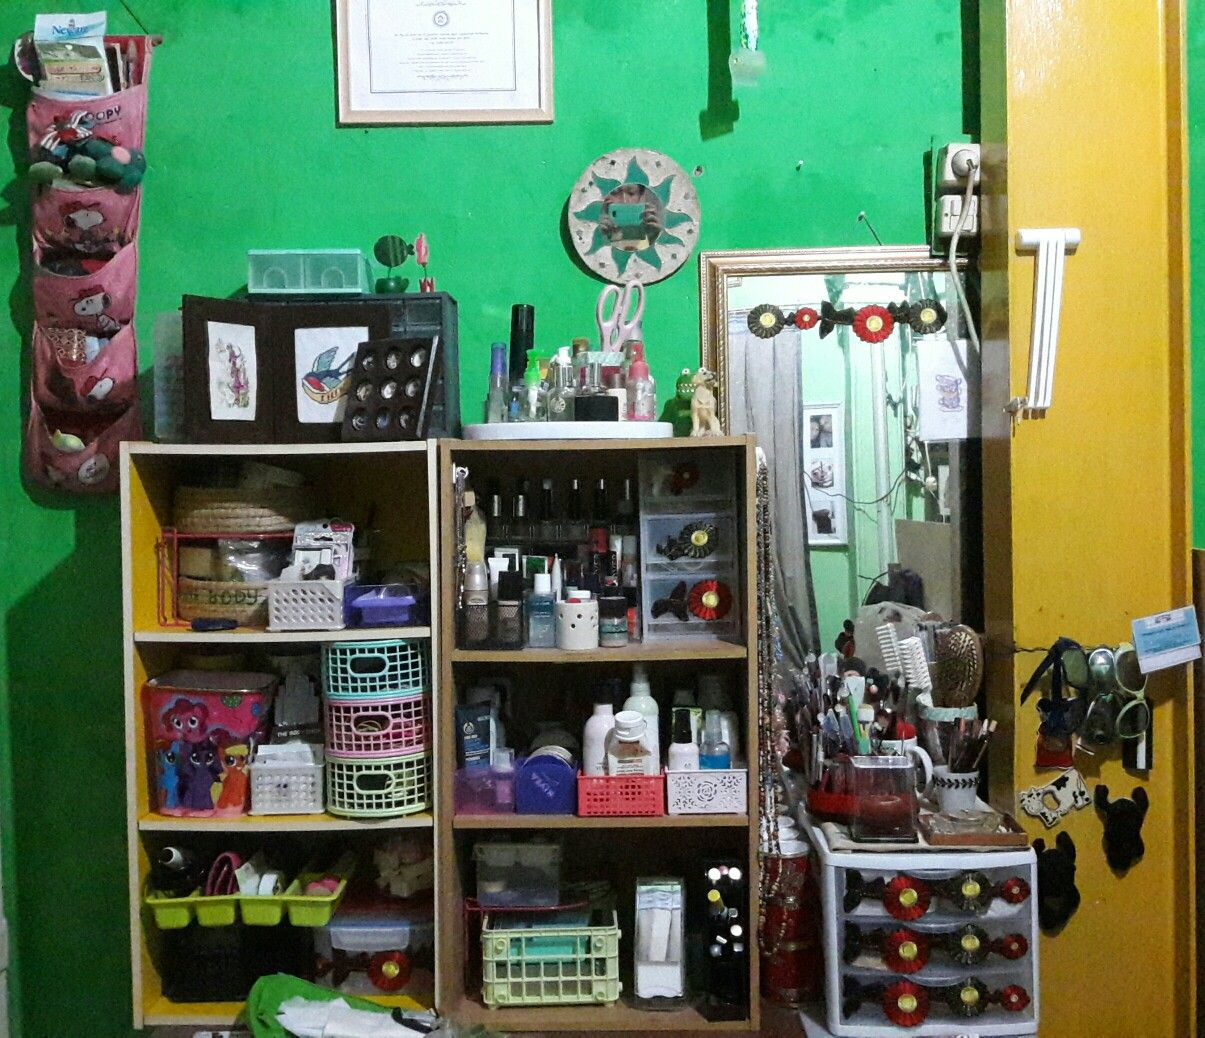 Still a mesh but not to bad organized pinterest organizing